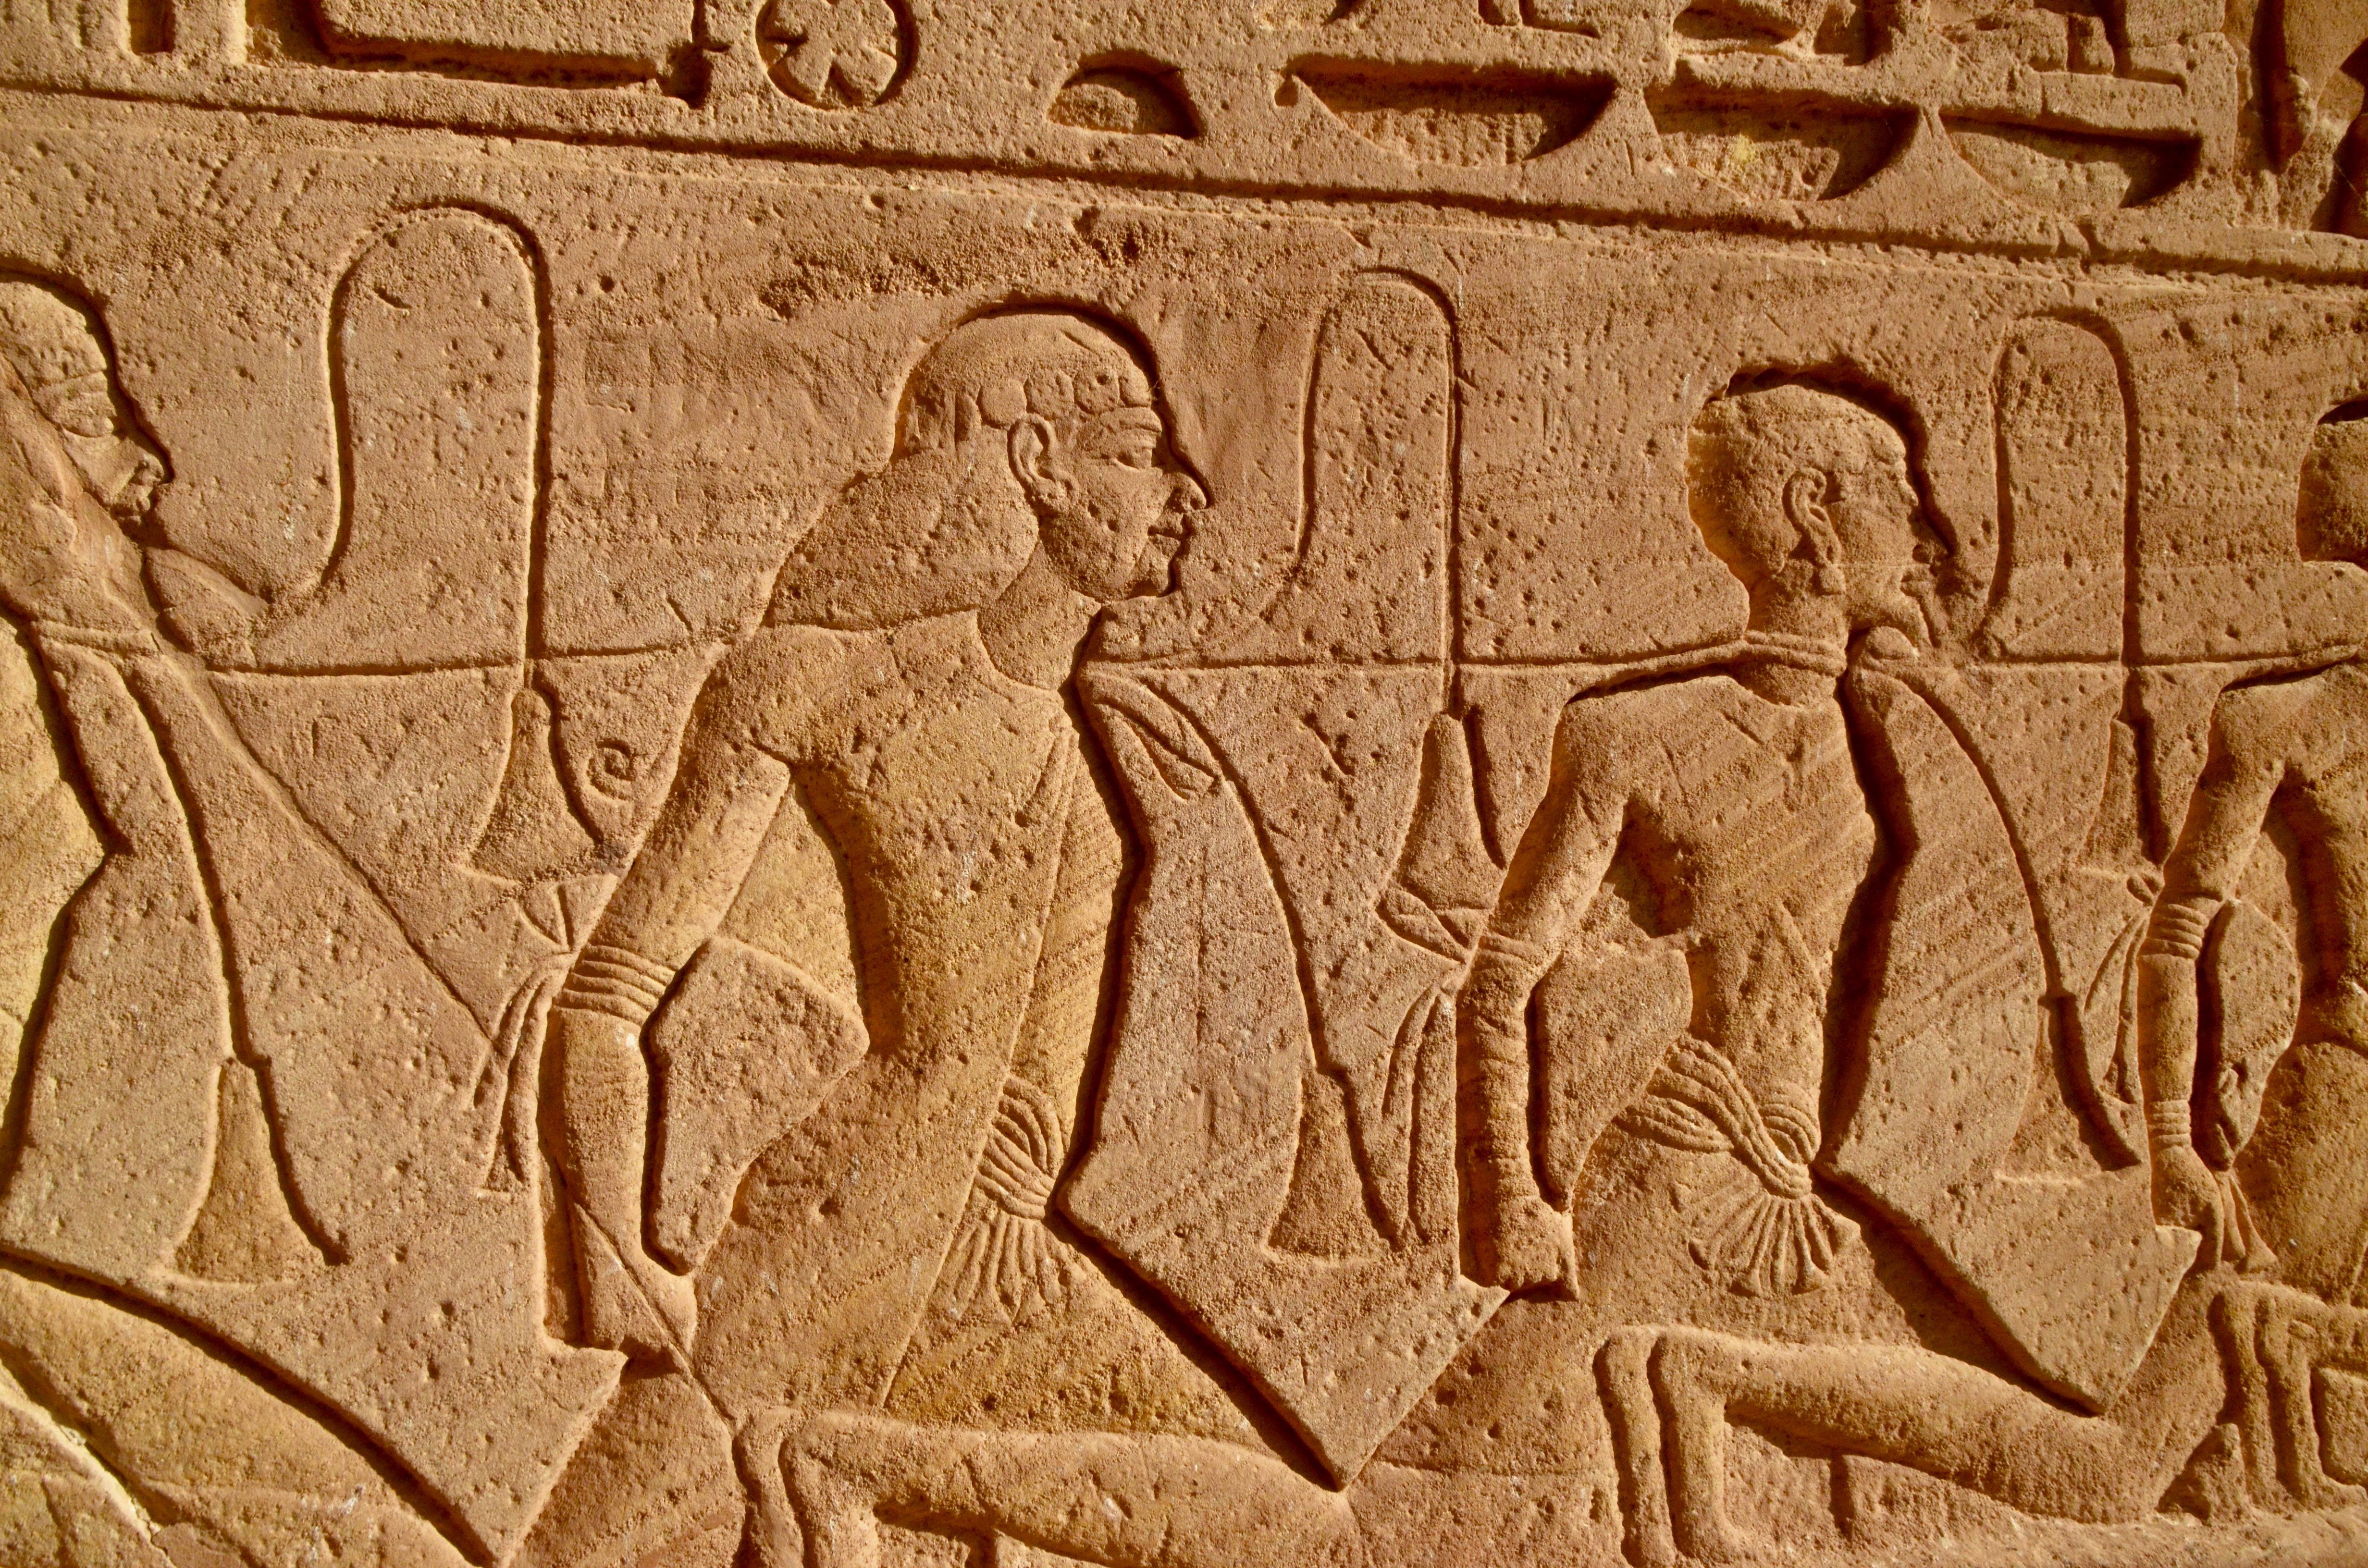 Hittite Prisoners, Abu Simbel